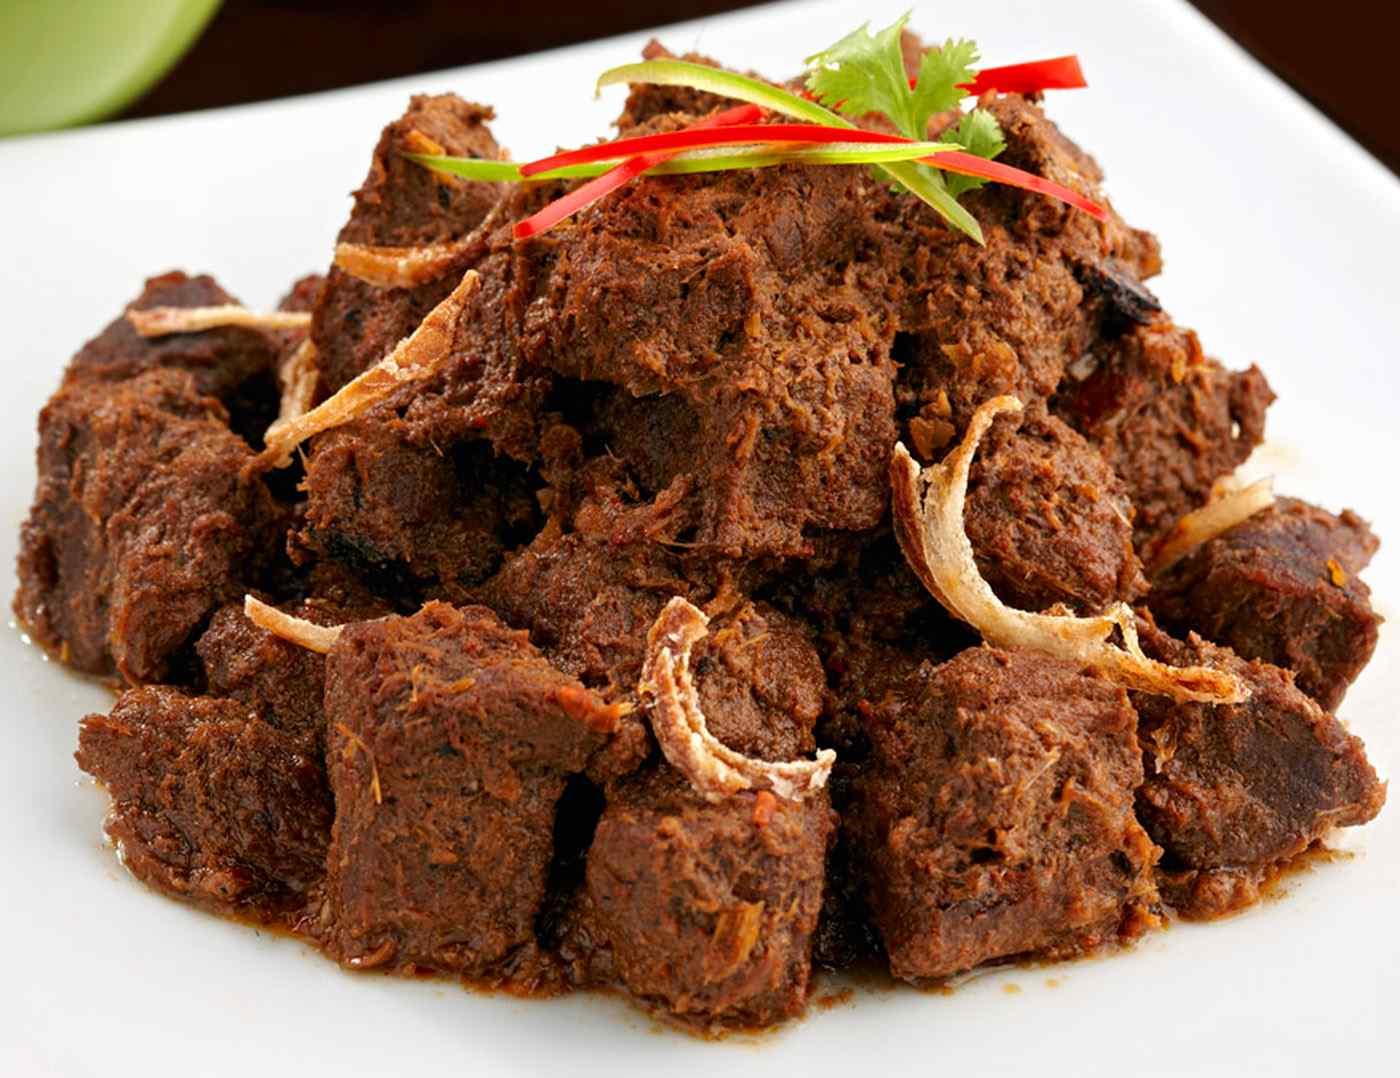 Resep Masakan Daging Sapi